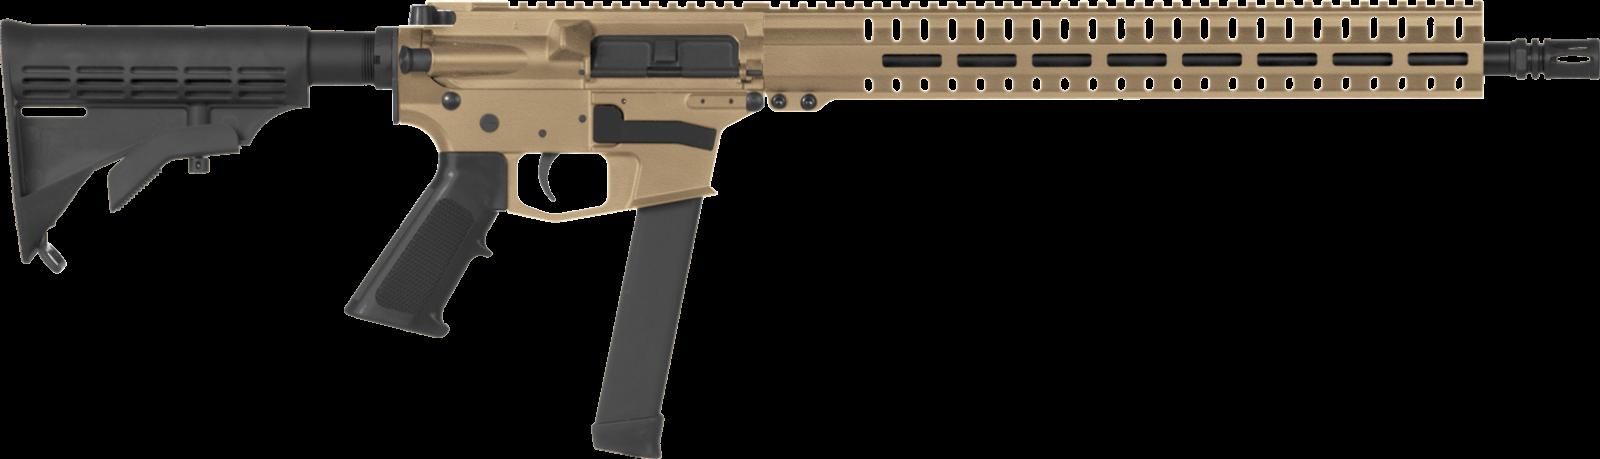 Samonabíjecí puška CMMG Resolute 100 Rifle MkGs - 9 x 19, FDE